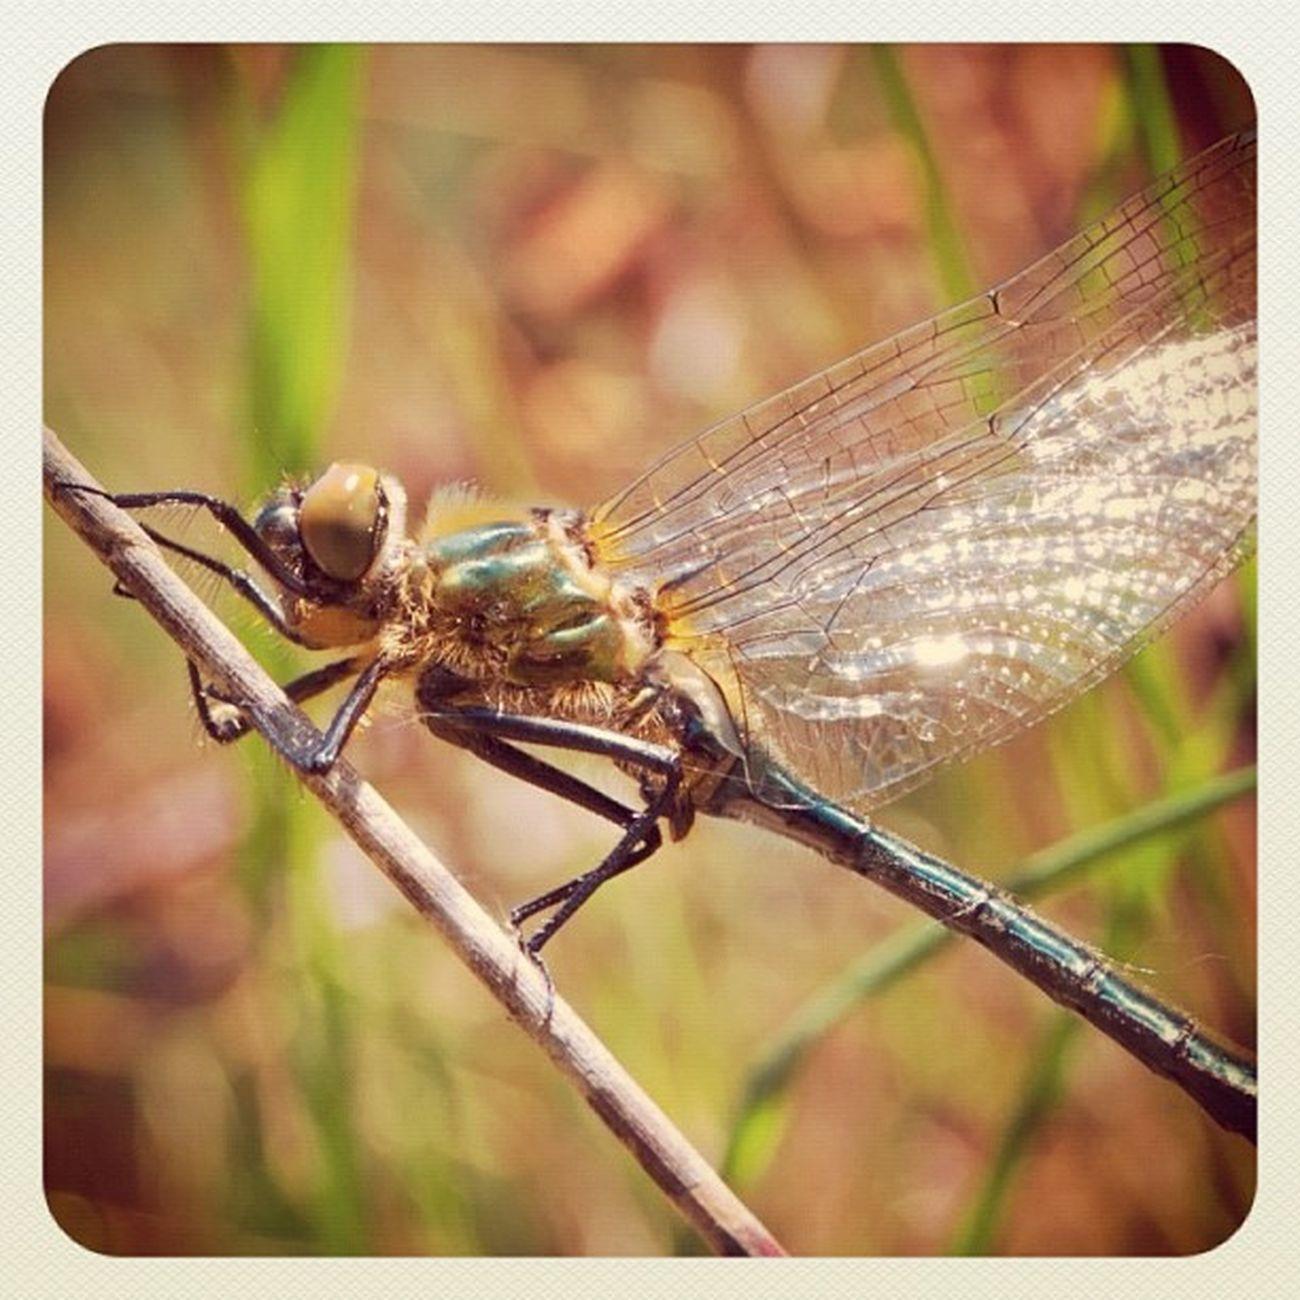 Dragonfly Dragonflies Libelle Libelula naarden naardermeer nature natureporn natureeza insect ig_naturelovers iphonesia bug abugslife